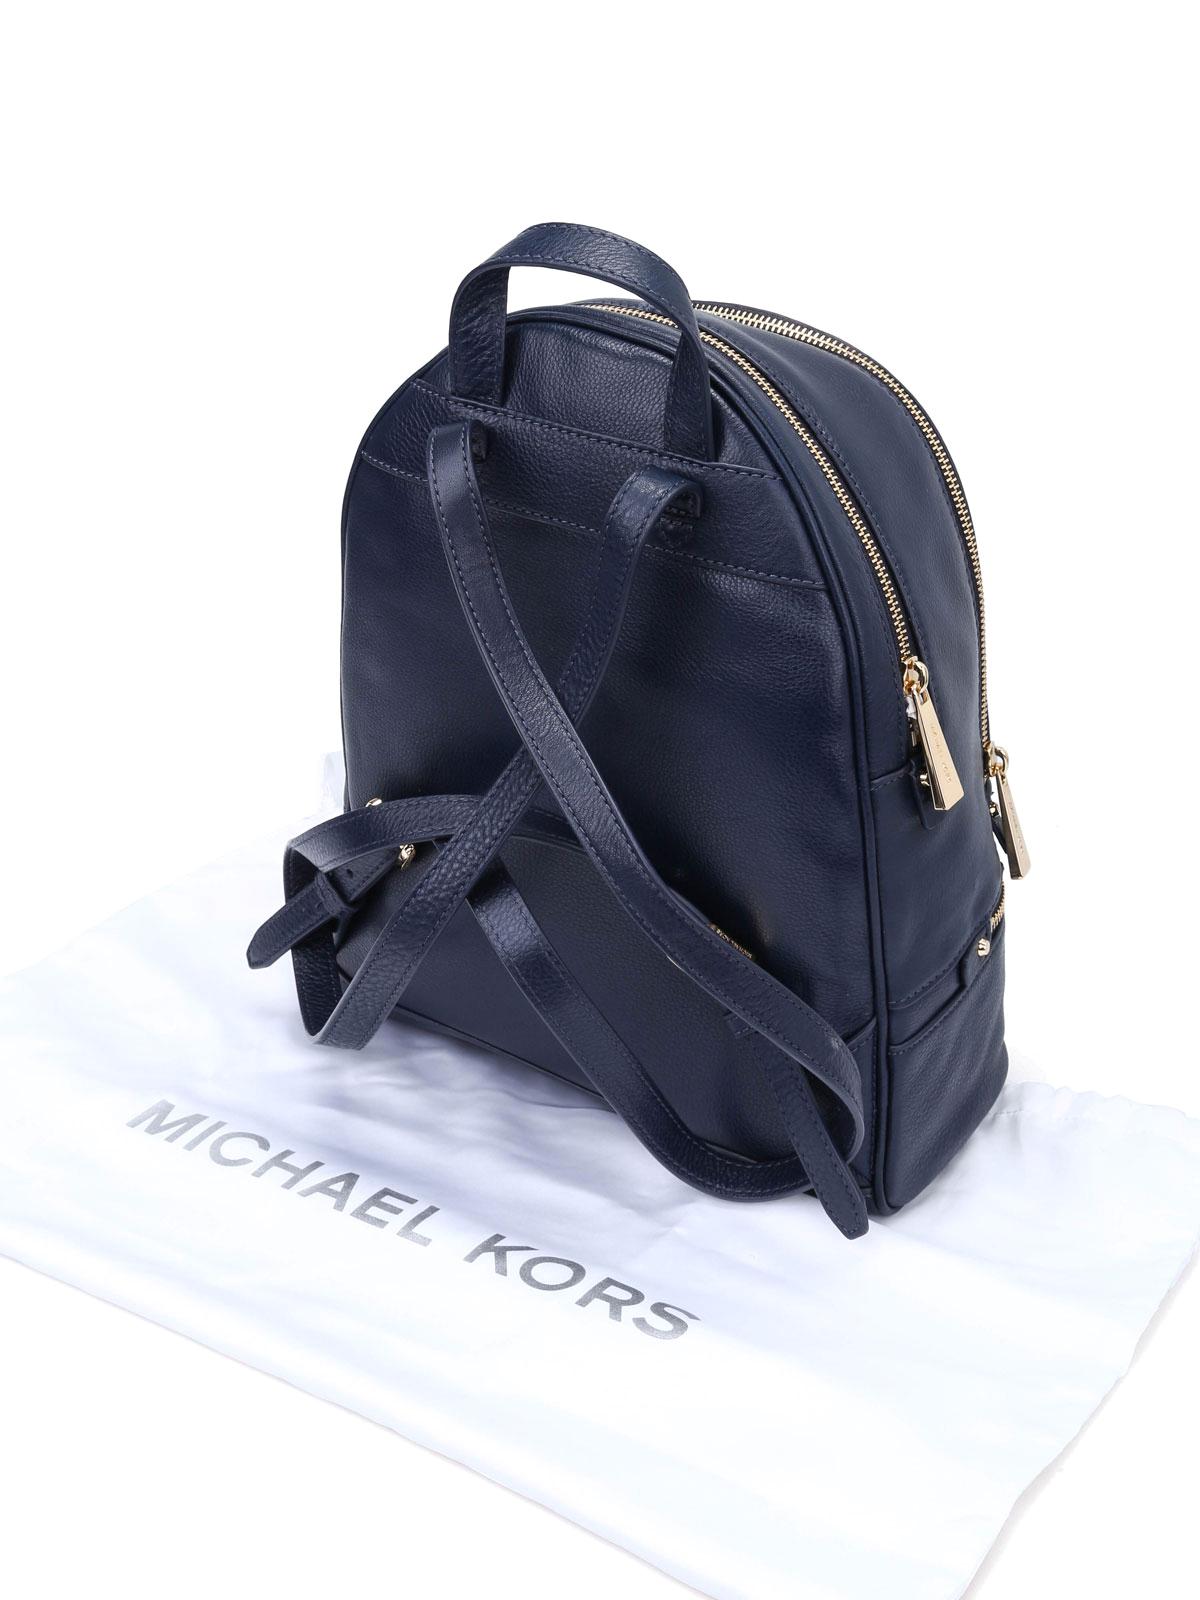 Michael Kors Rhea medium backpack backpacks 30S5GEZB1L 414